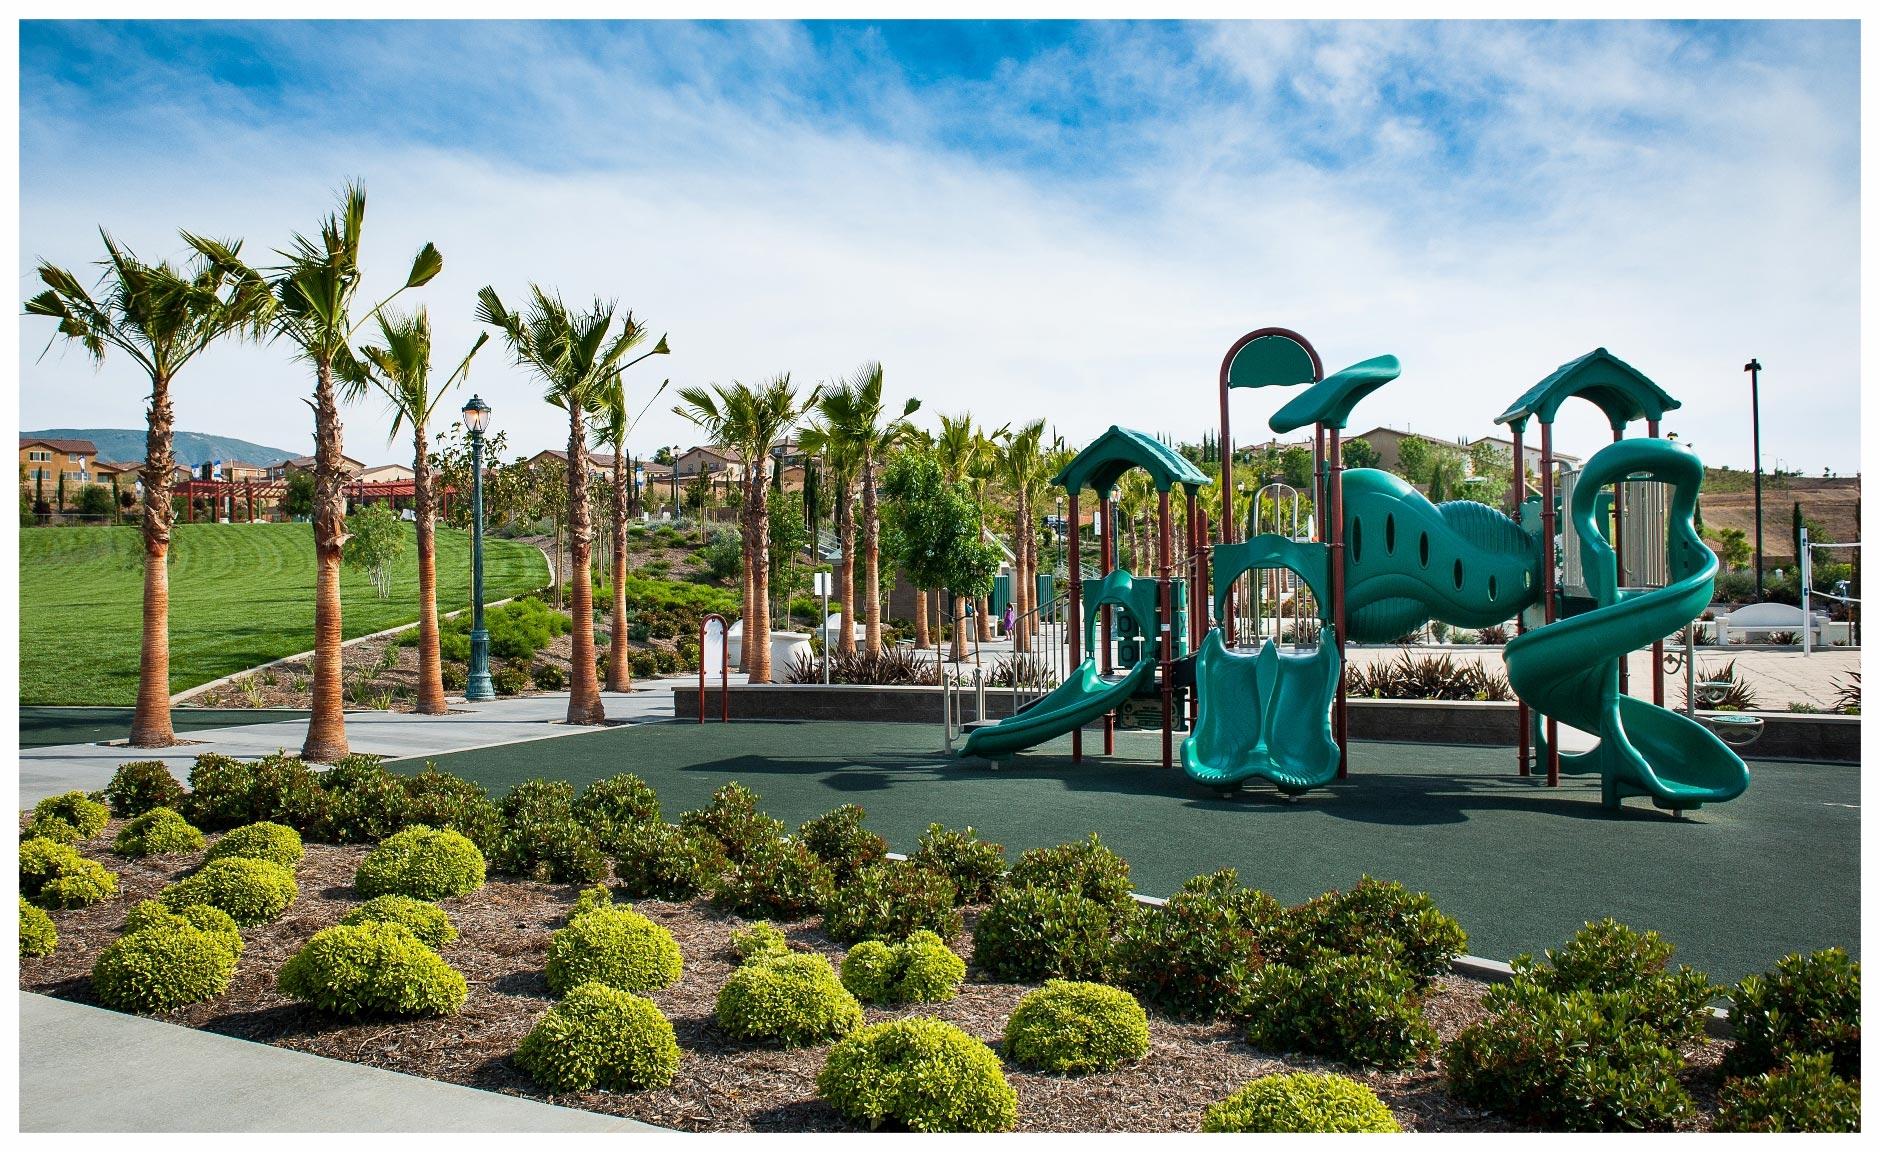 Madigan Park